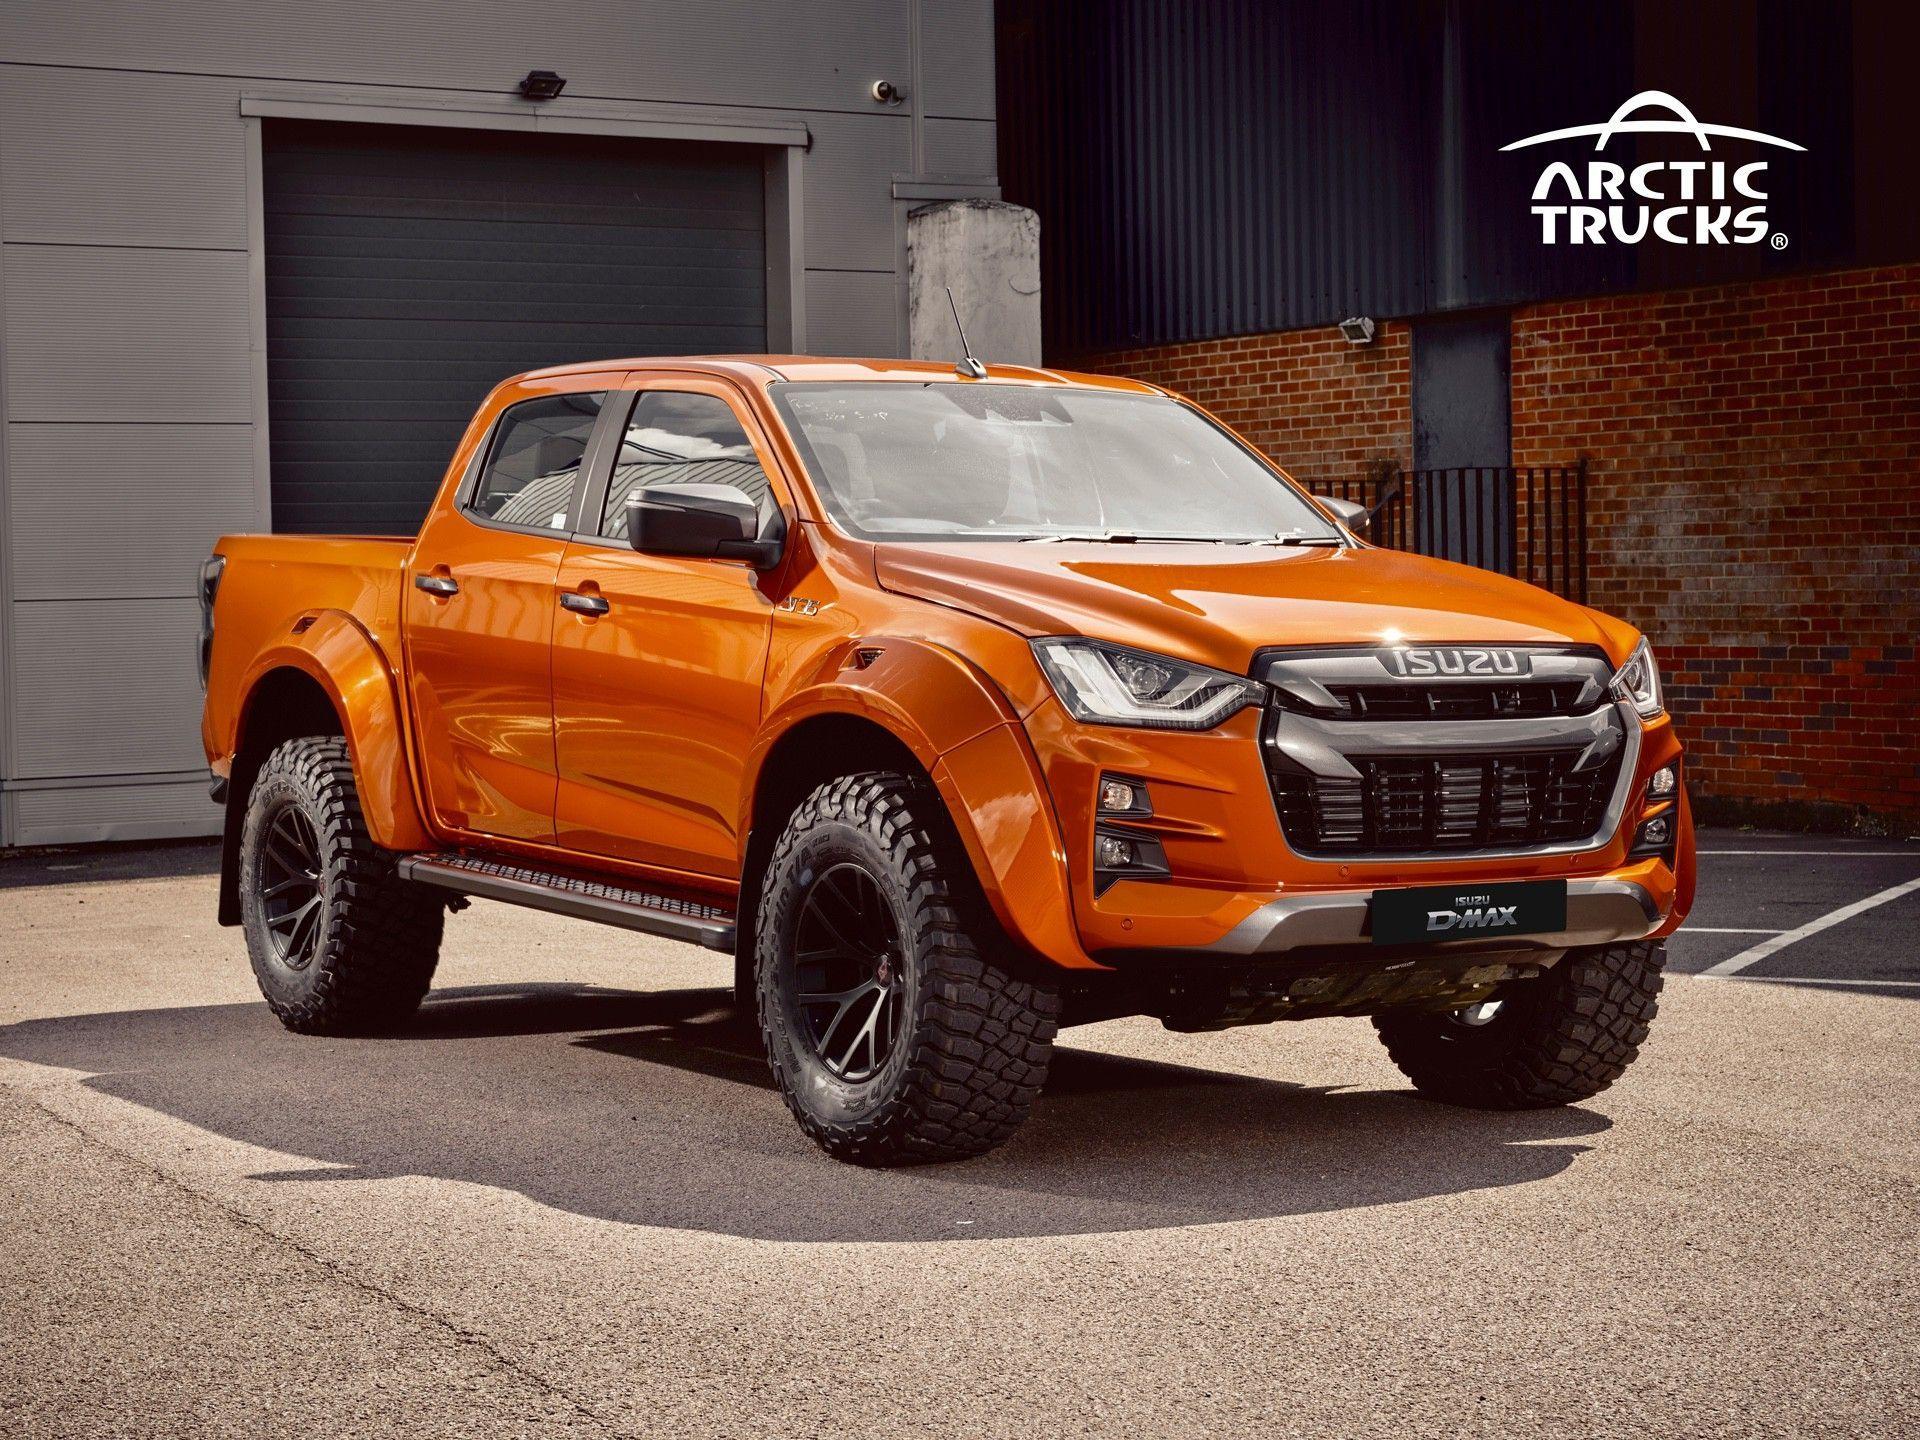 2022_Isuzu_D-Max_Arctic_Trucks_AT35-0004